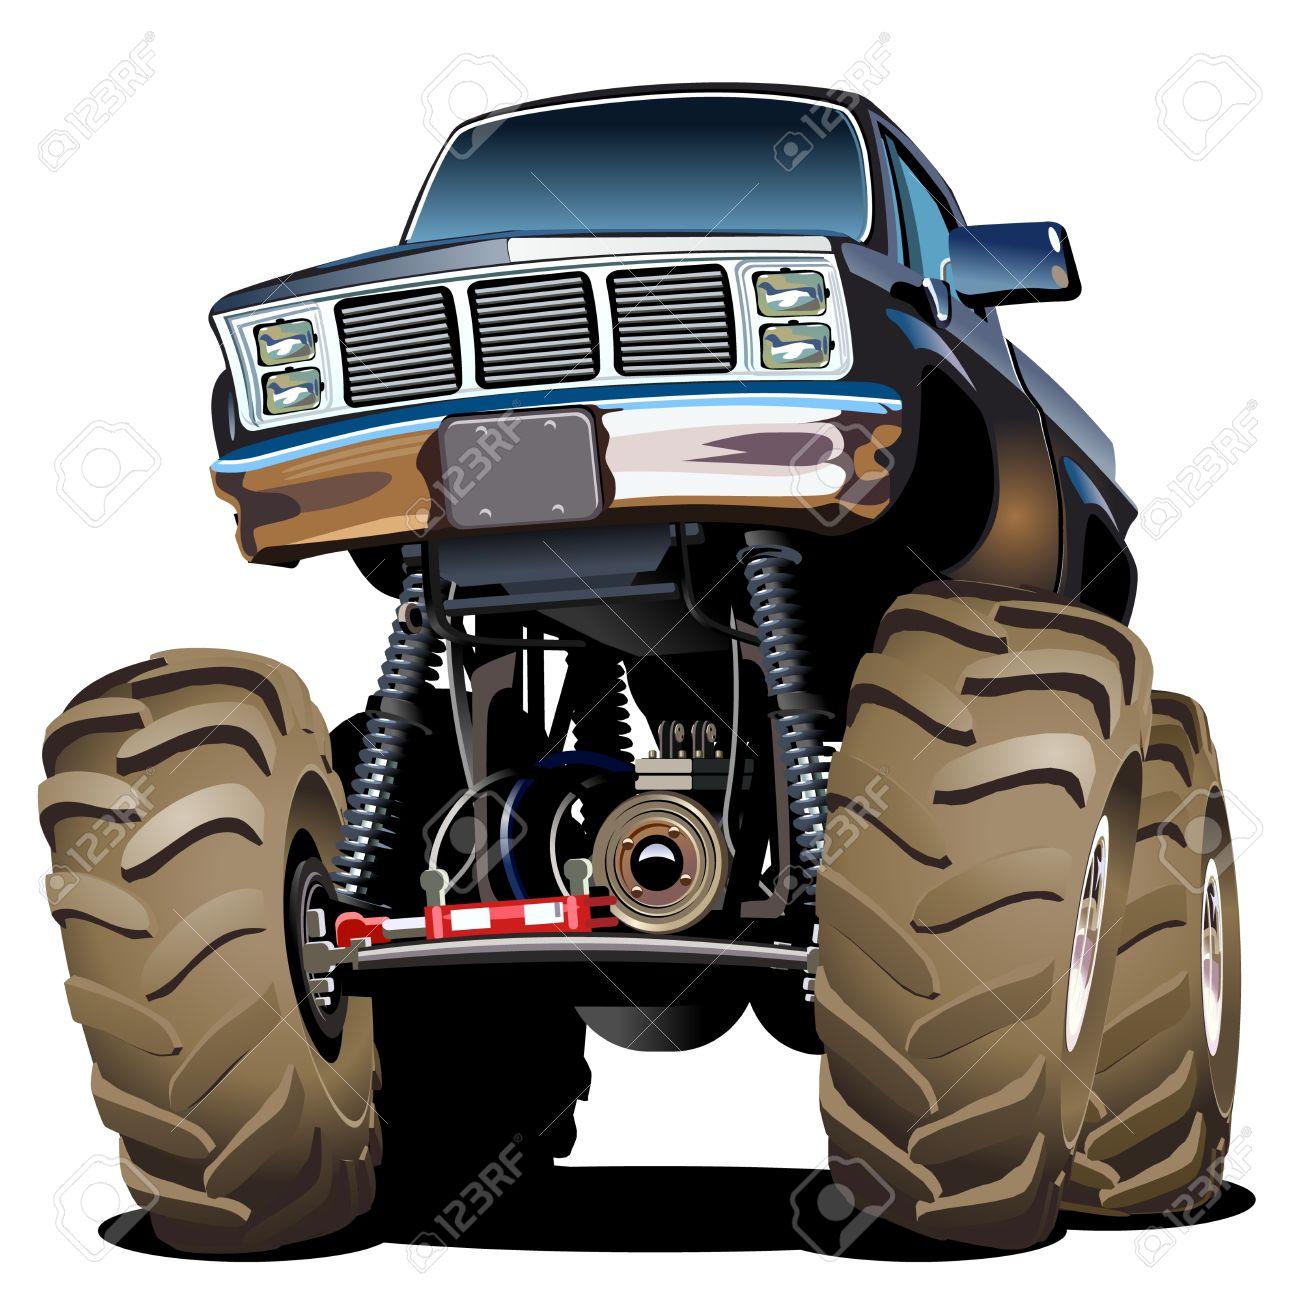 Cartoon Monster Truck Stock Vector - 19583130